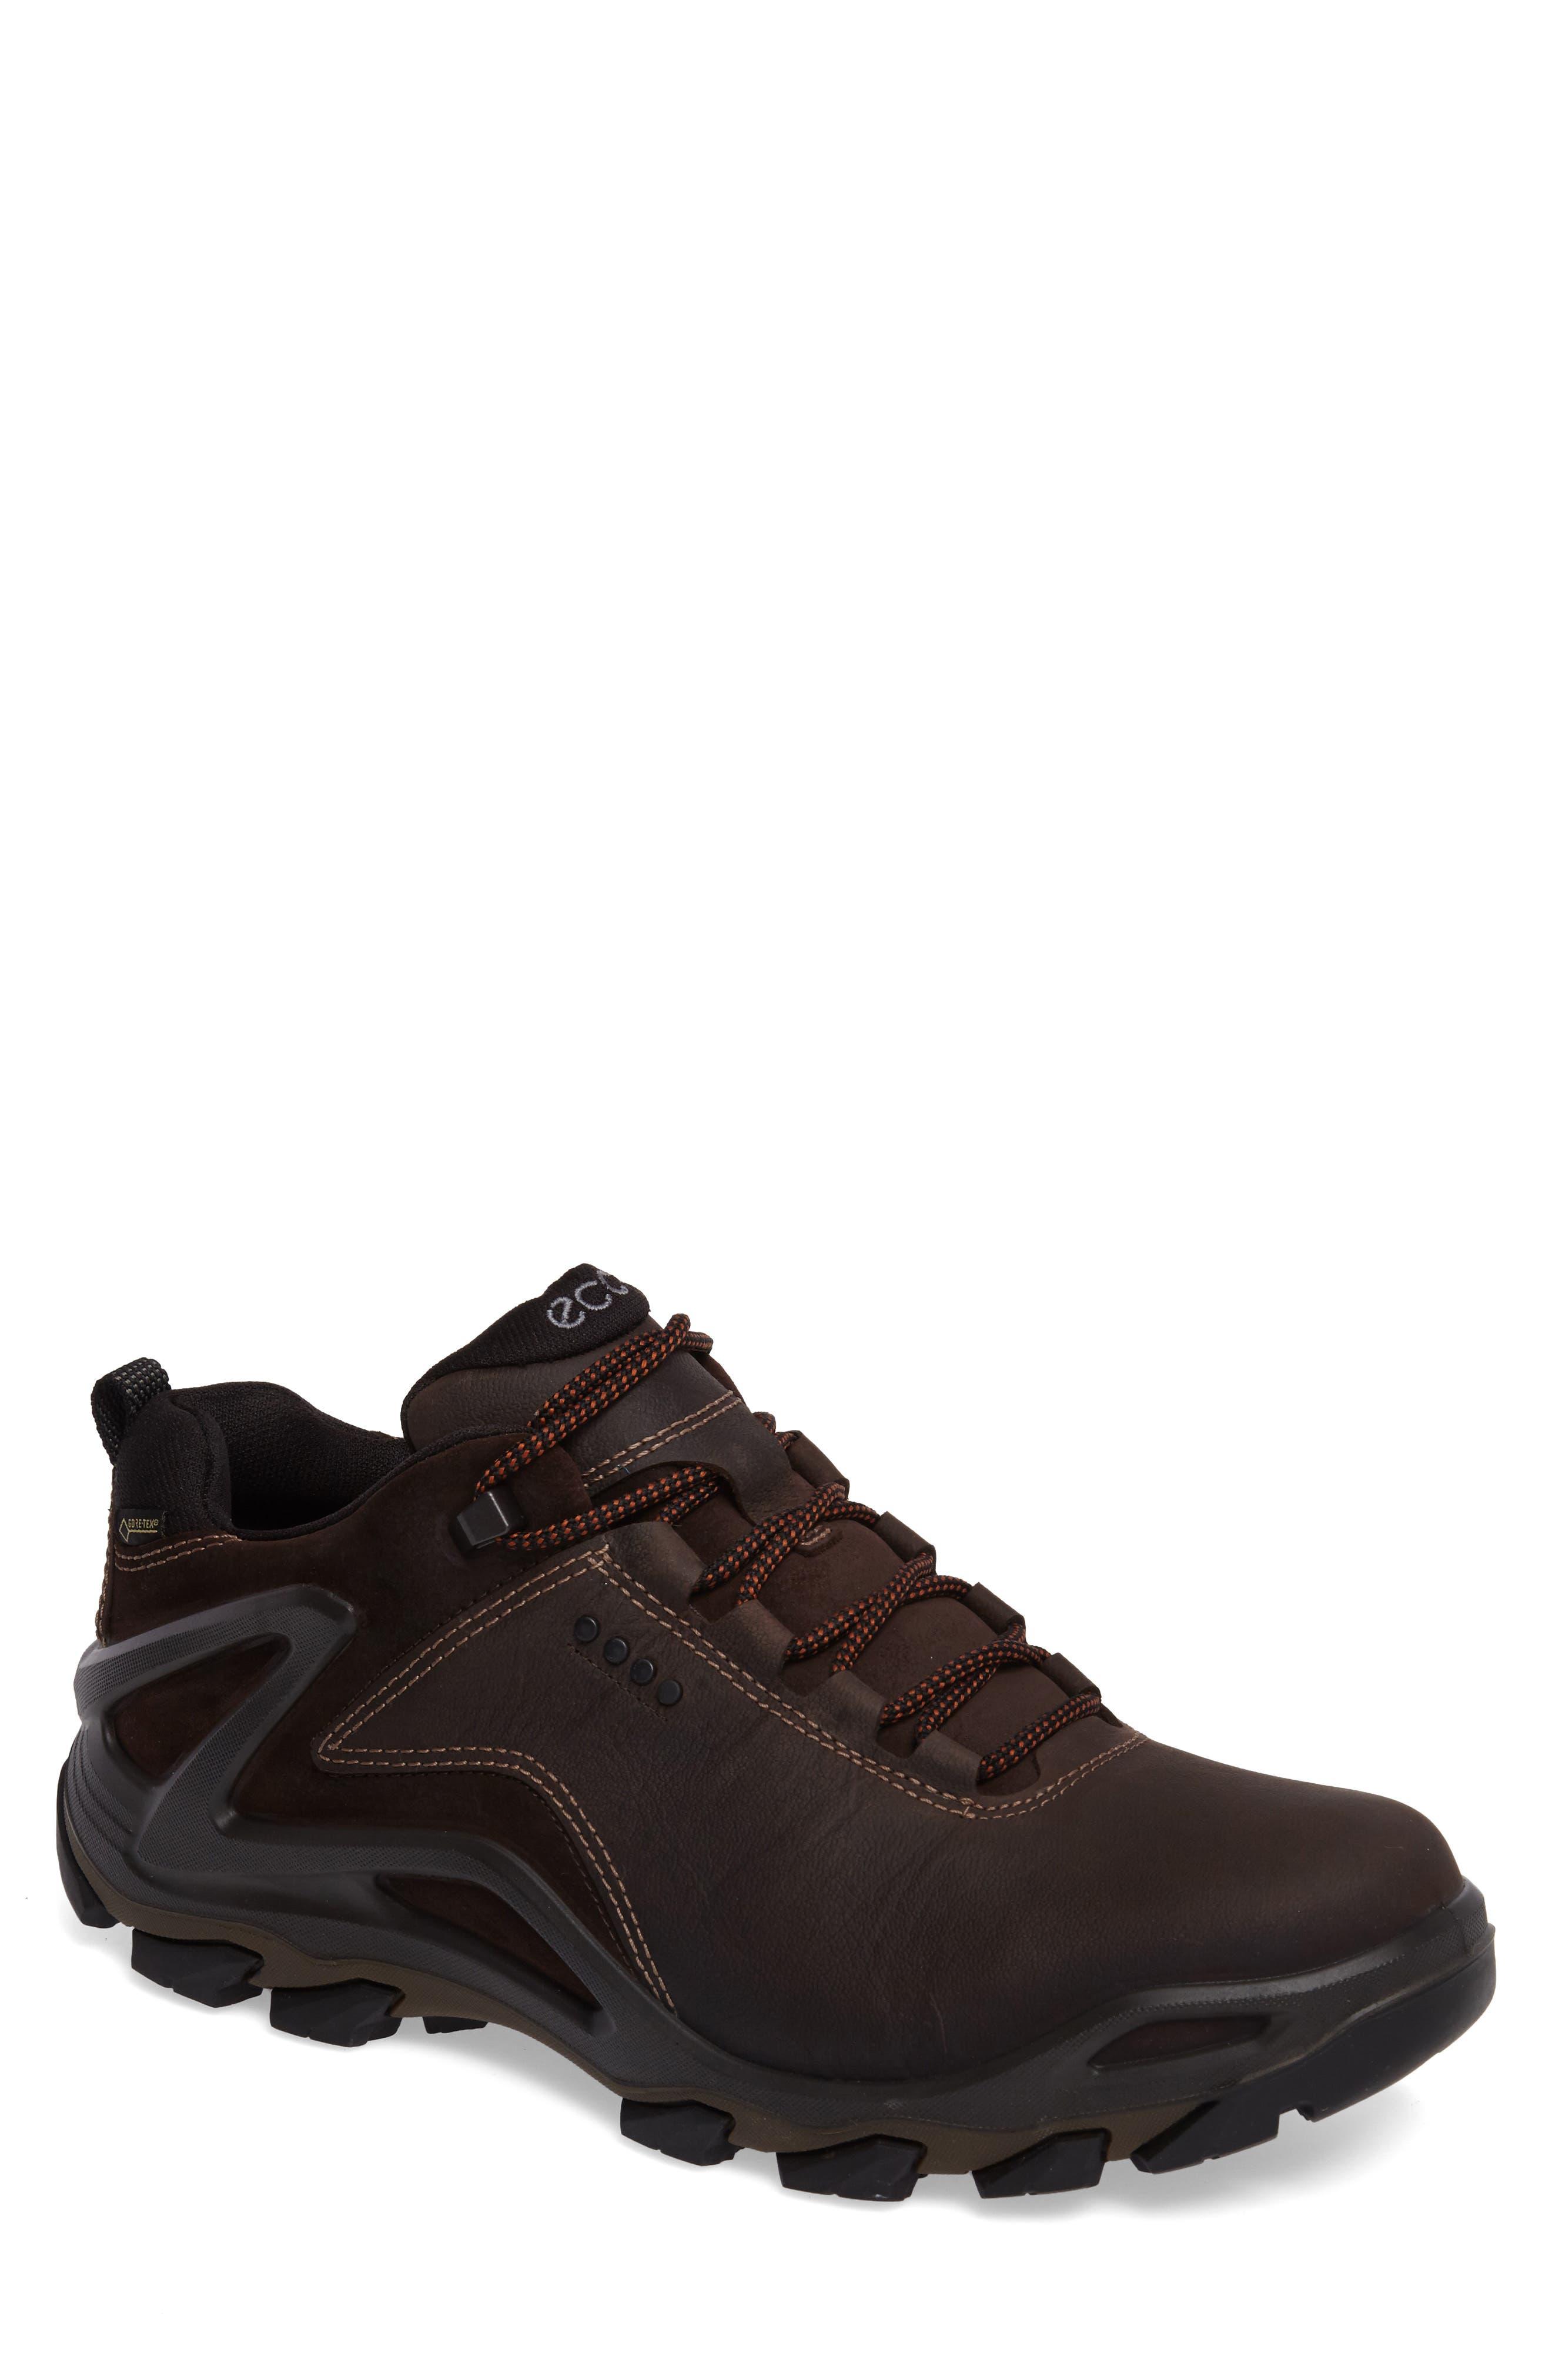 Terra Evo GTX Low Hiking Shoe,                             Main thumbnail 1, color,                             Coffee/ Mocha Nubuck